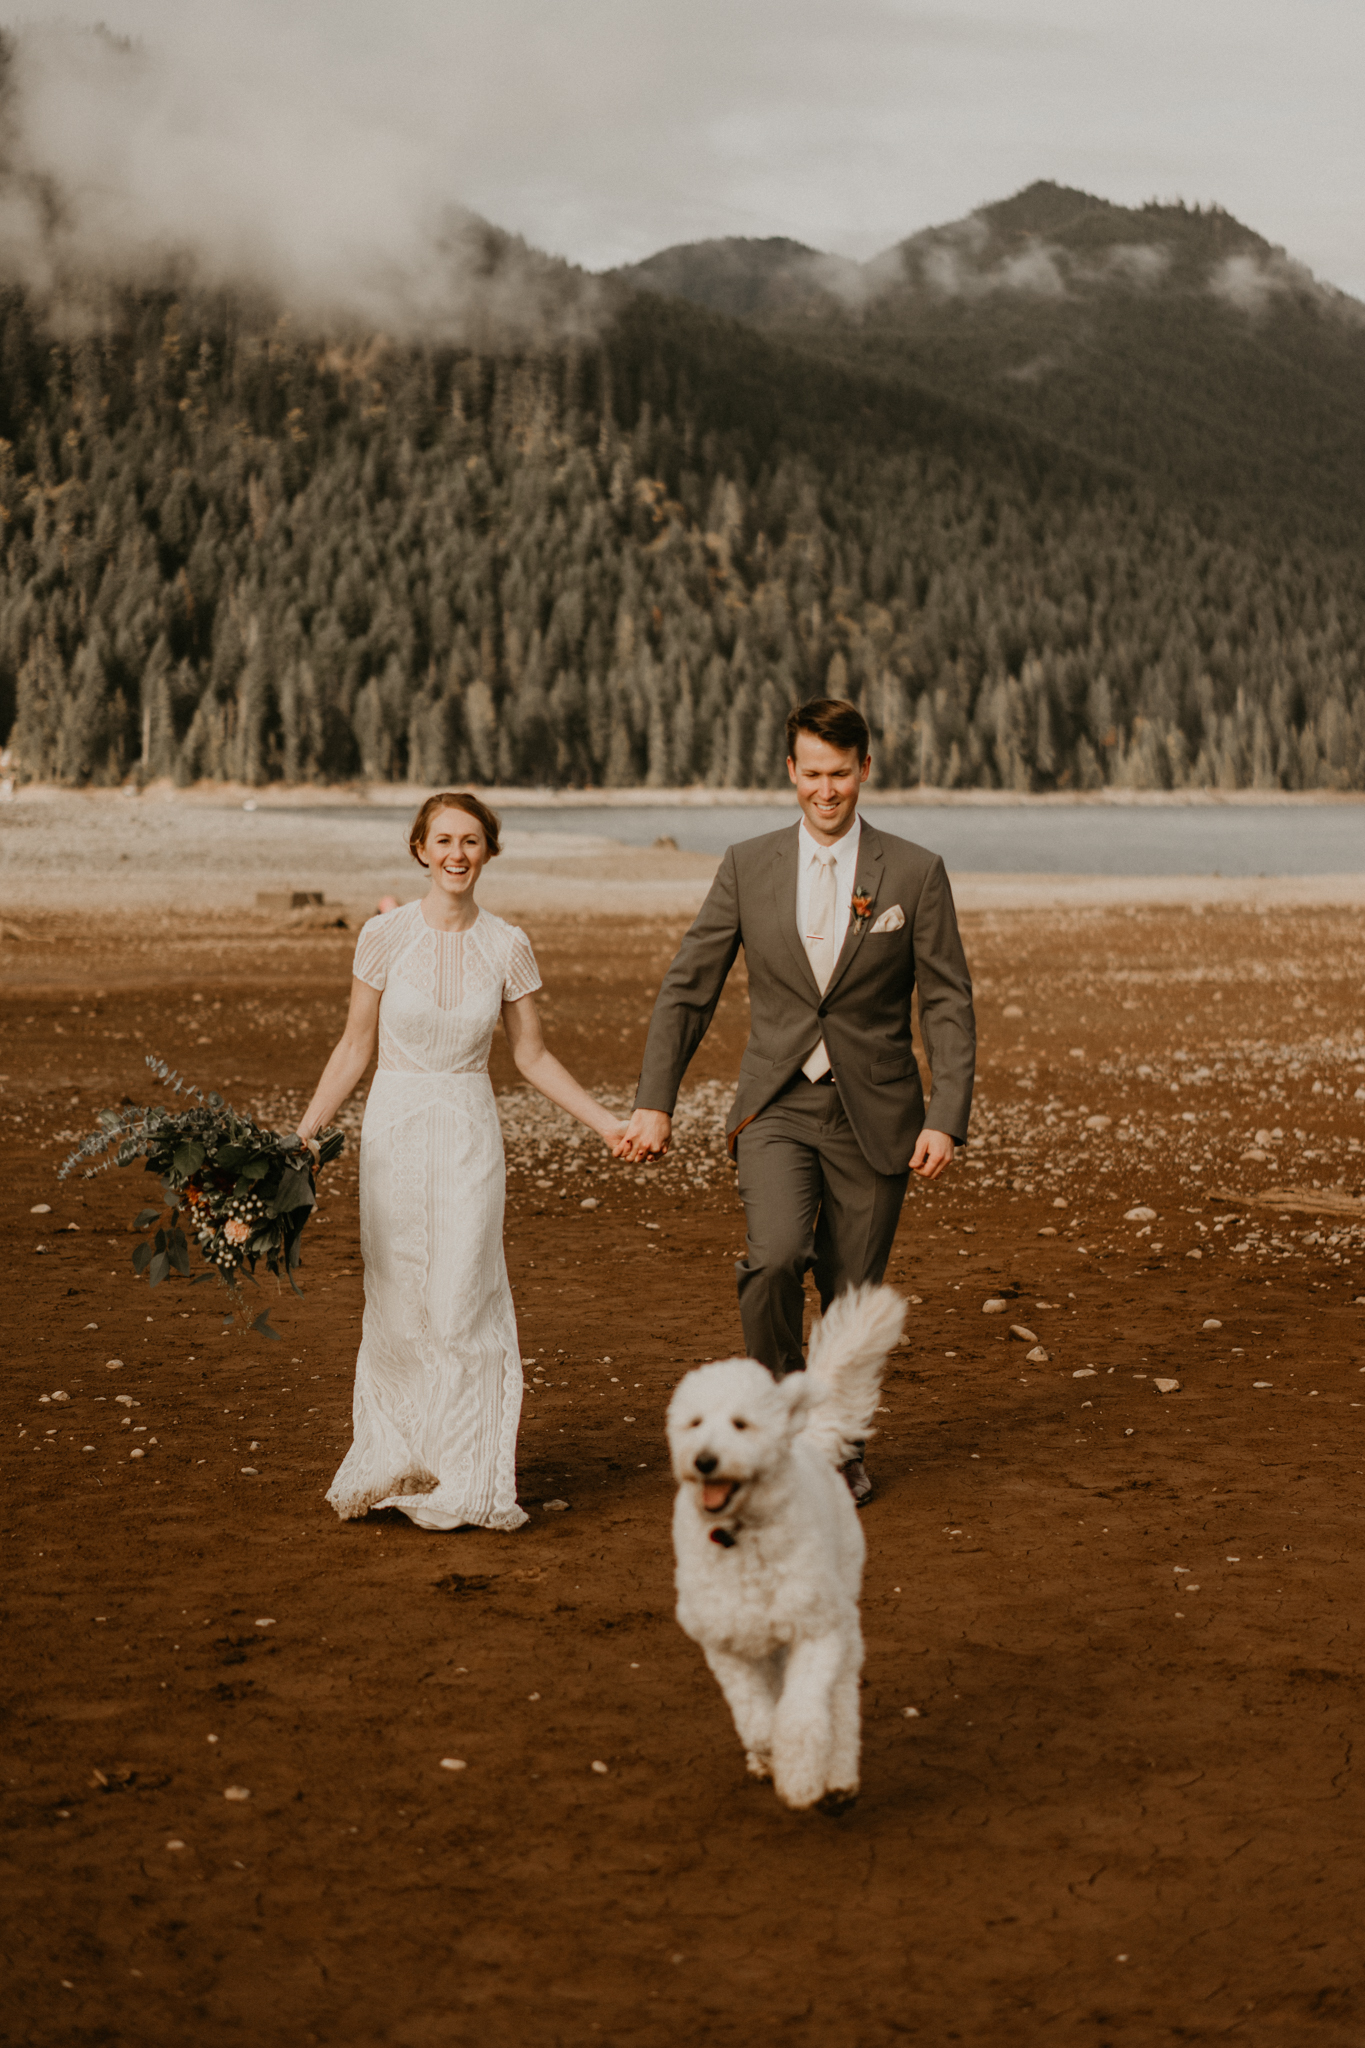 Wedding venue that allows pets in Seattle, Washington